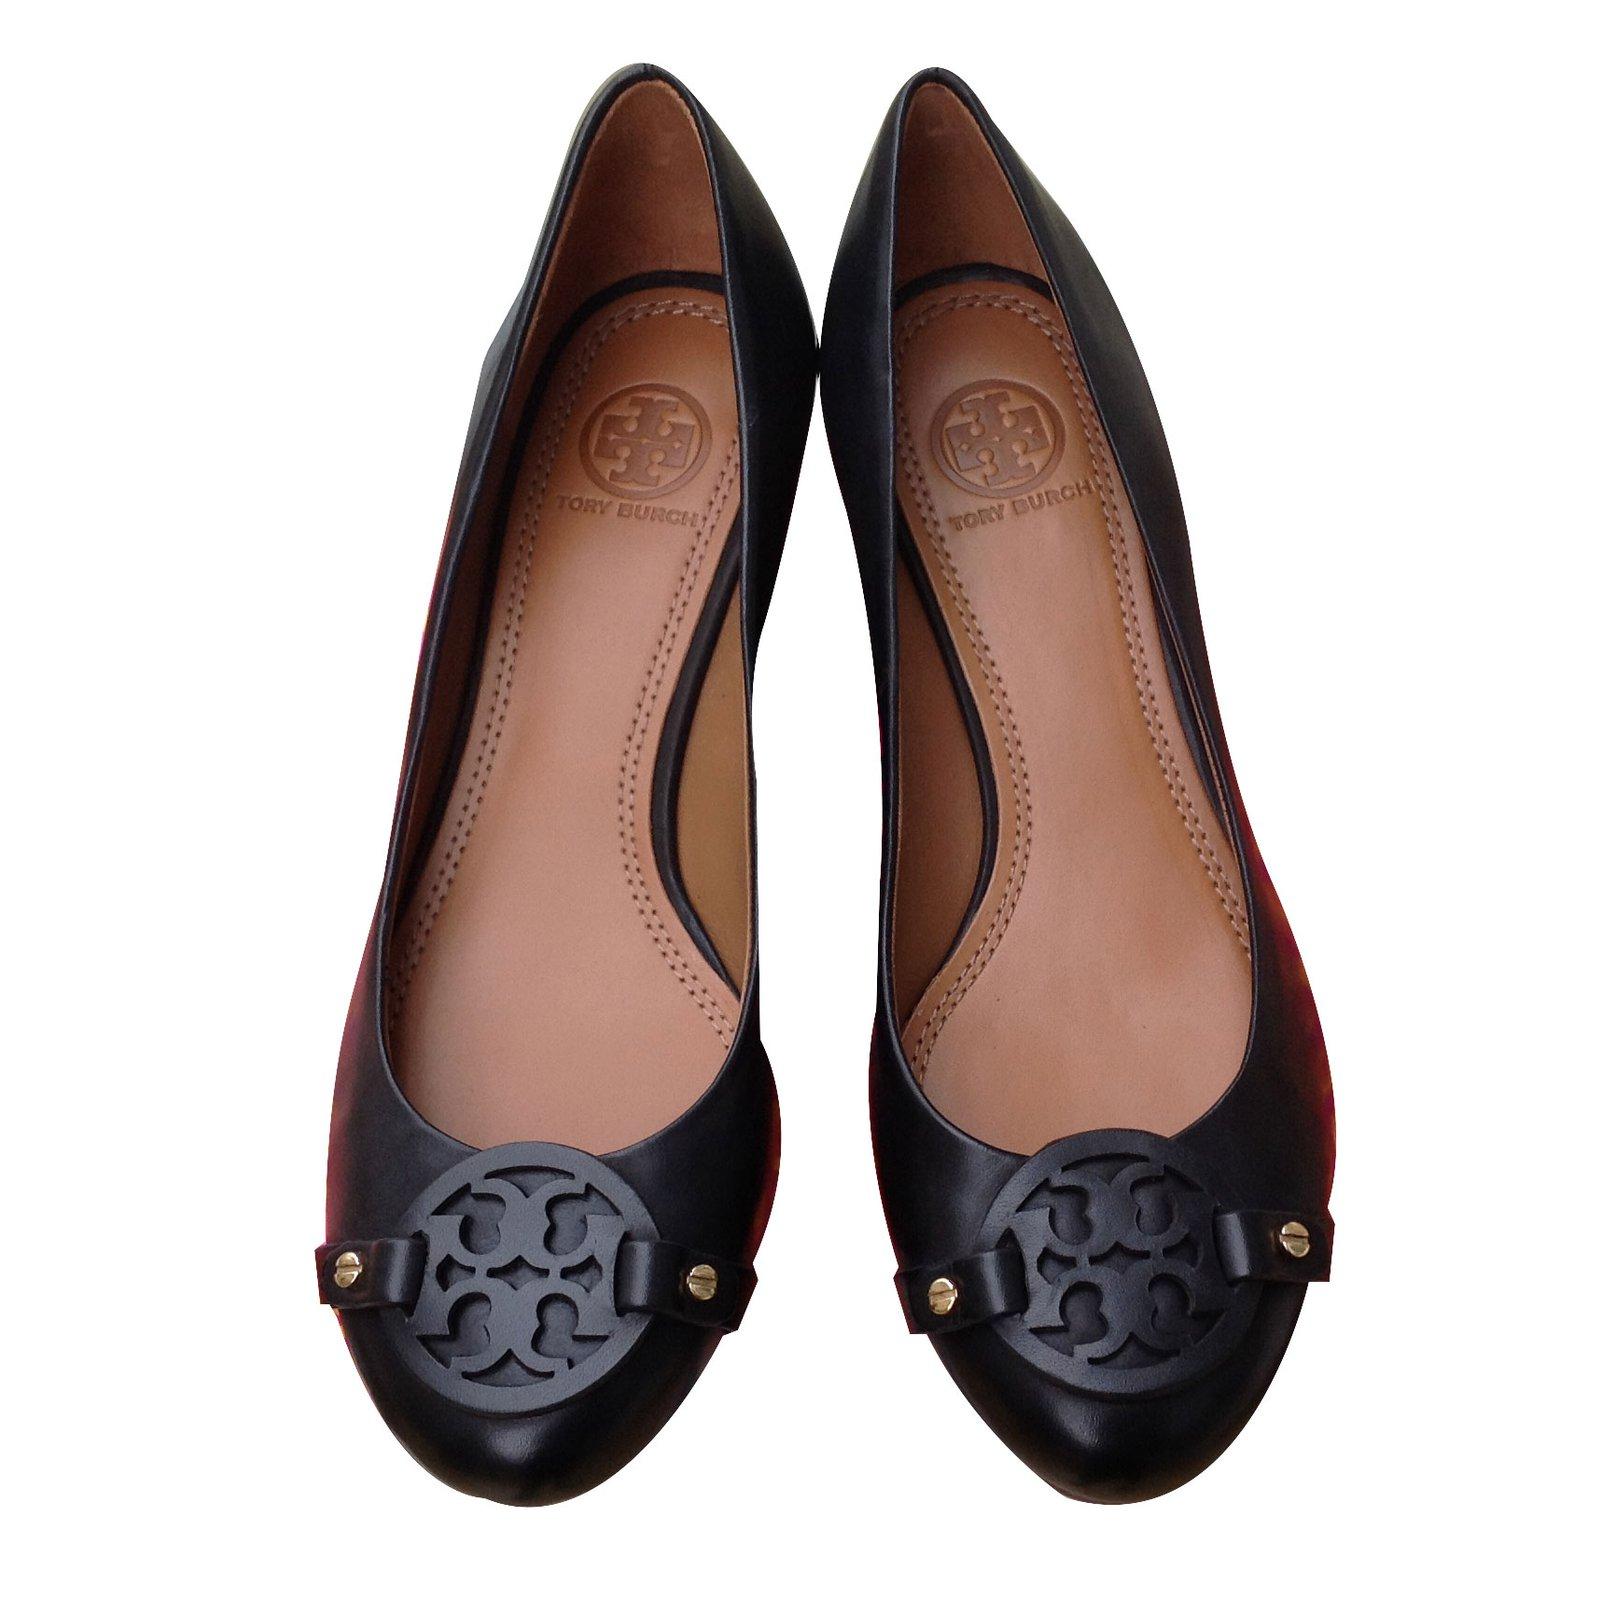 6eb857e1e Tory Burch Ballerinas Wedge mules Leather Black ref.20471 - Joli Closet